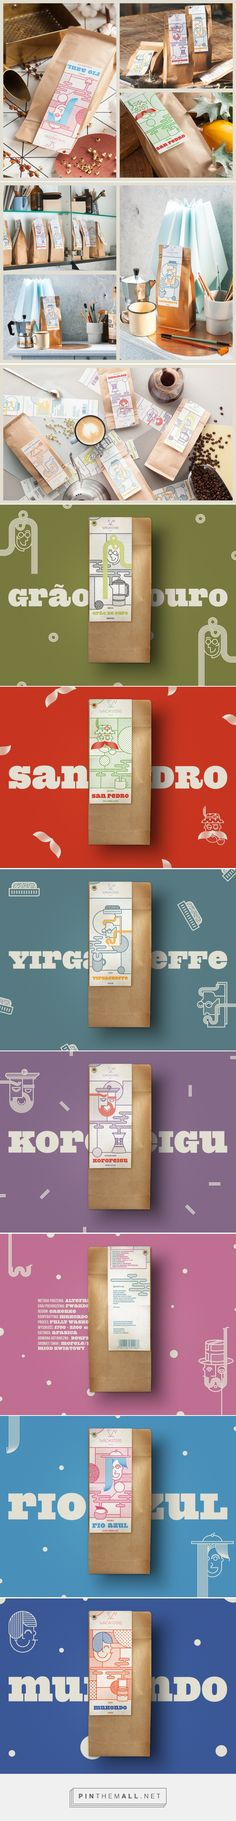 Wroasters Coffee - Packaging of the World - Creative Package Design Gallery - http://www.packagingoftheworld.com/2017/02/wroasters-coffee.html